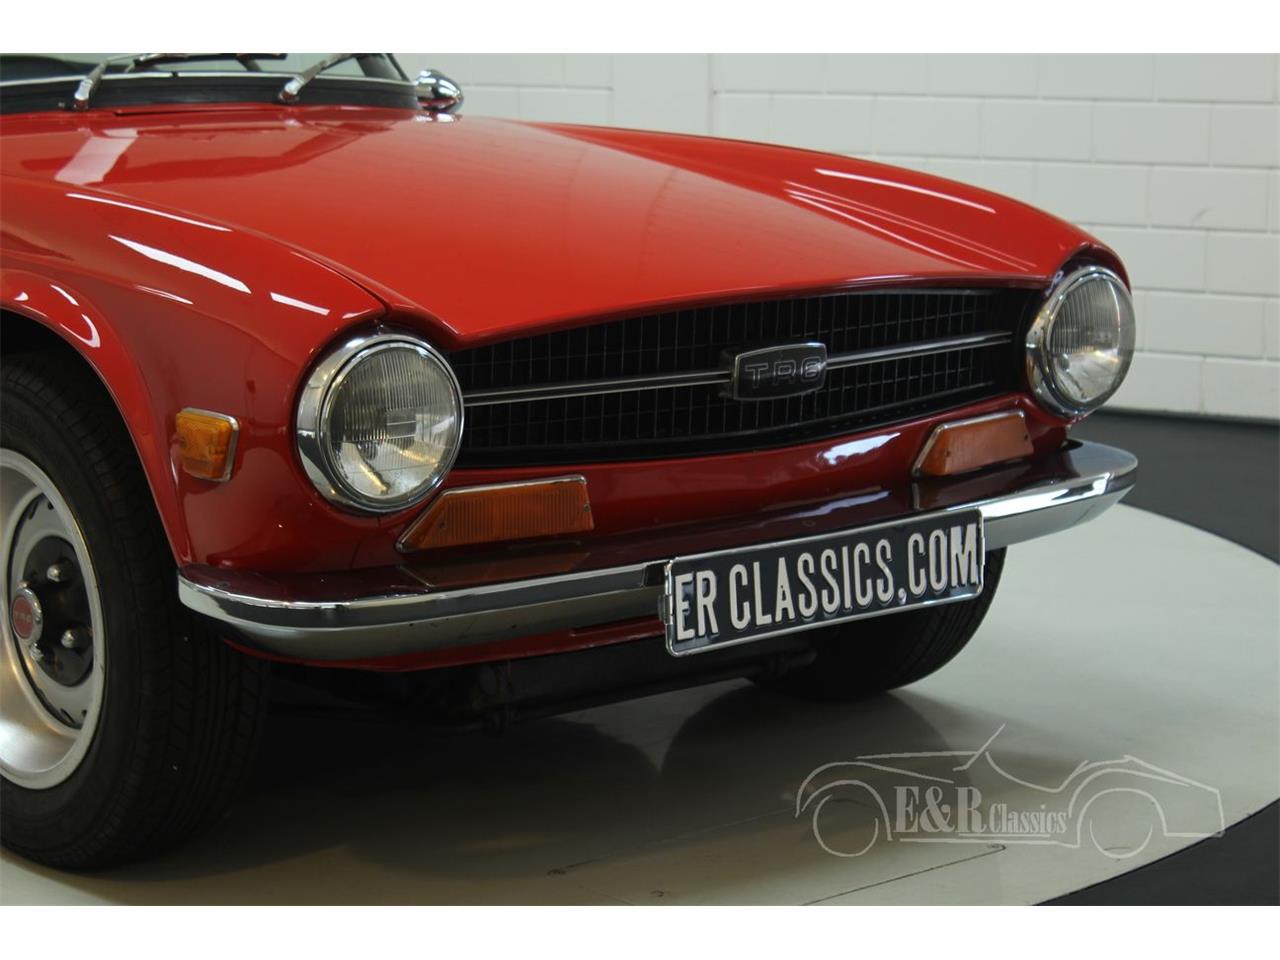 1970 Triumph TR6 (CC-1319340) for sale in Waalwijk, Noord-Brabant